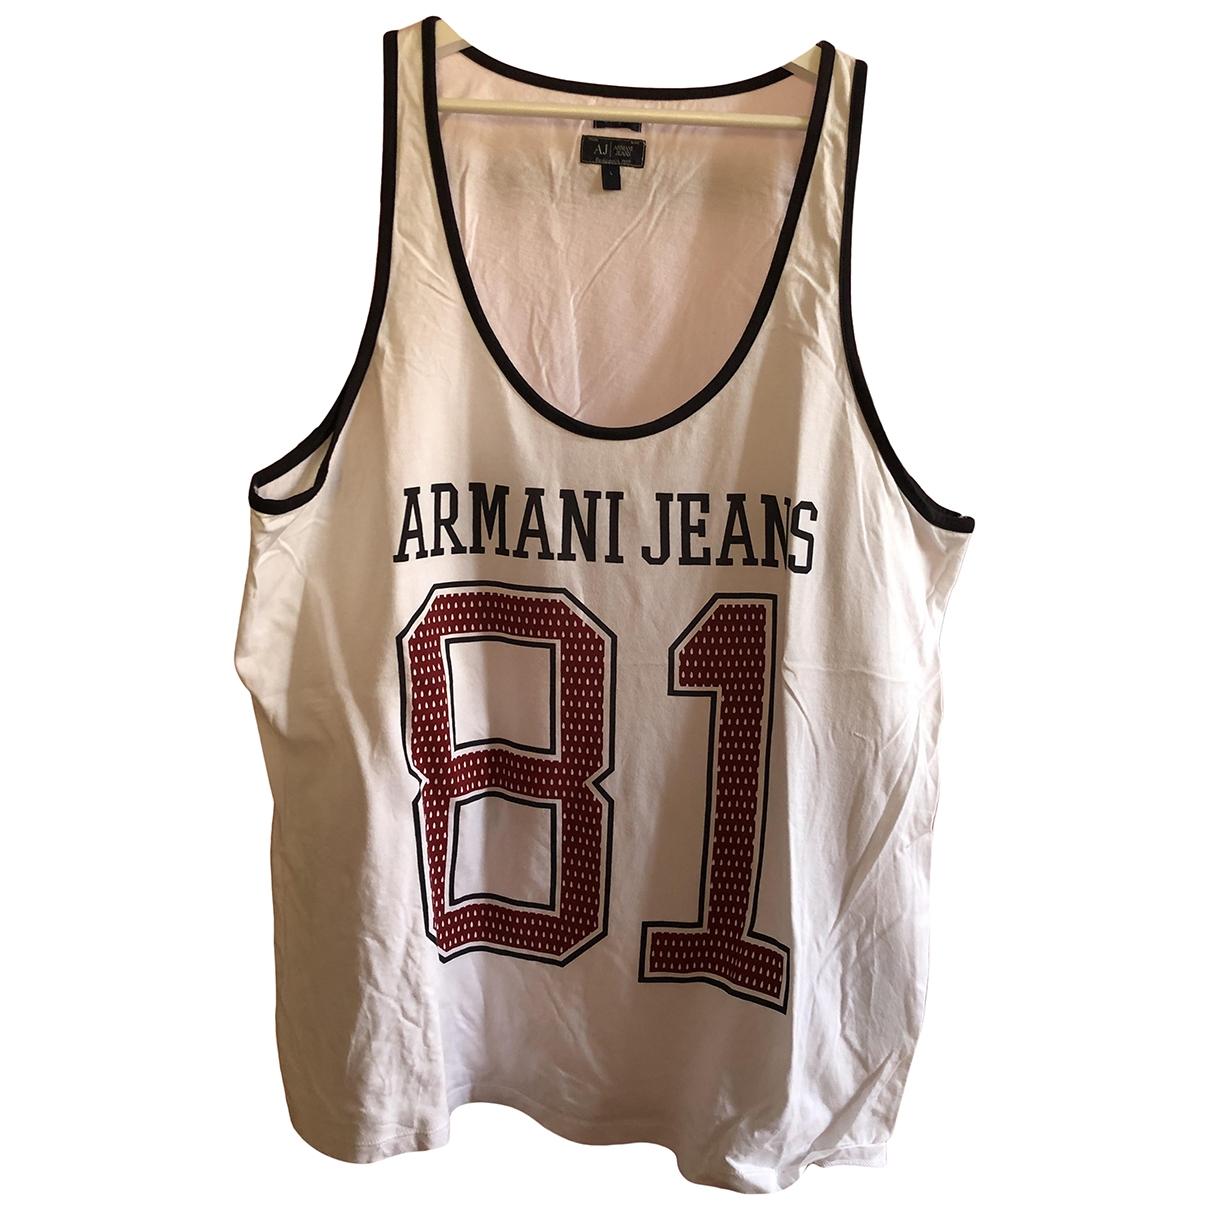 Armani Jean - Tee shirts   pour homme en coton - blanc